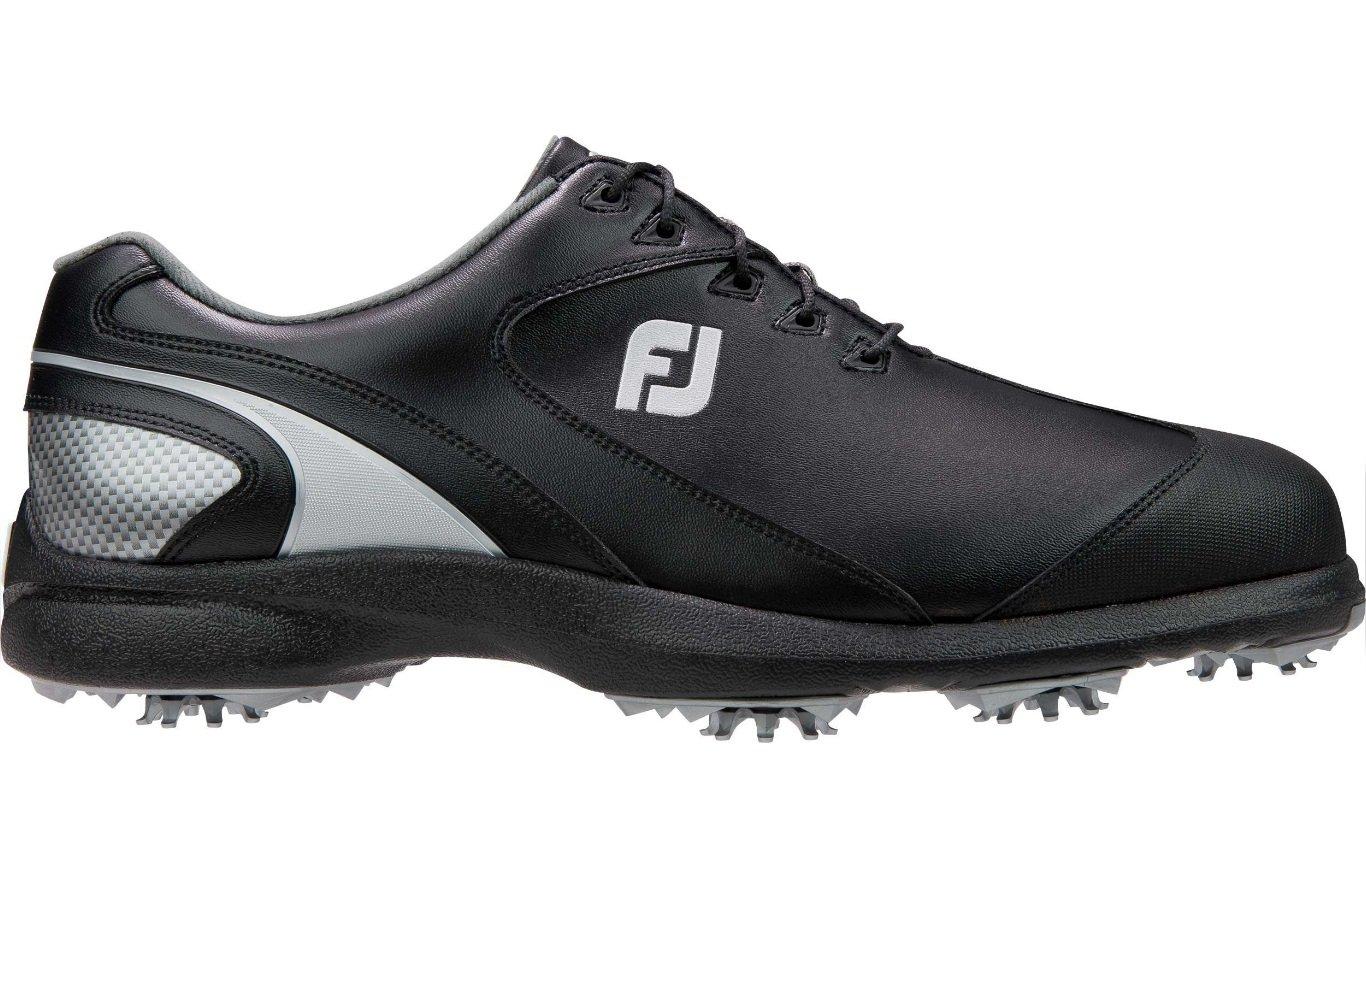 FootJoy Sport Lt Golf Shoes B01MG1RY8L 10 D(M) US| black/Silver